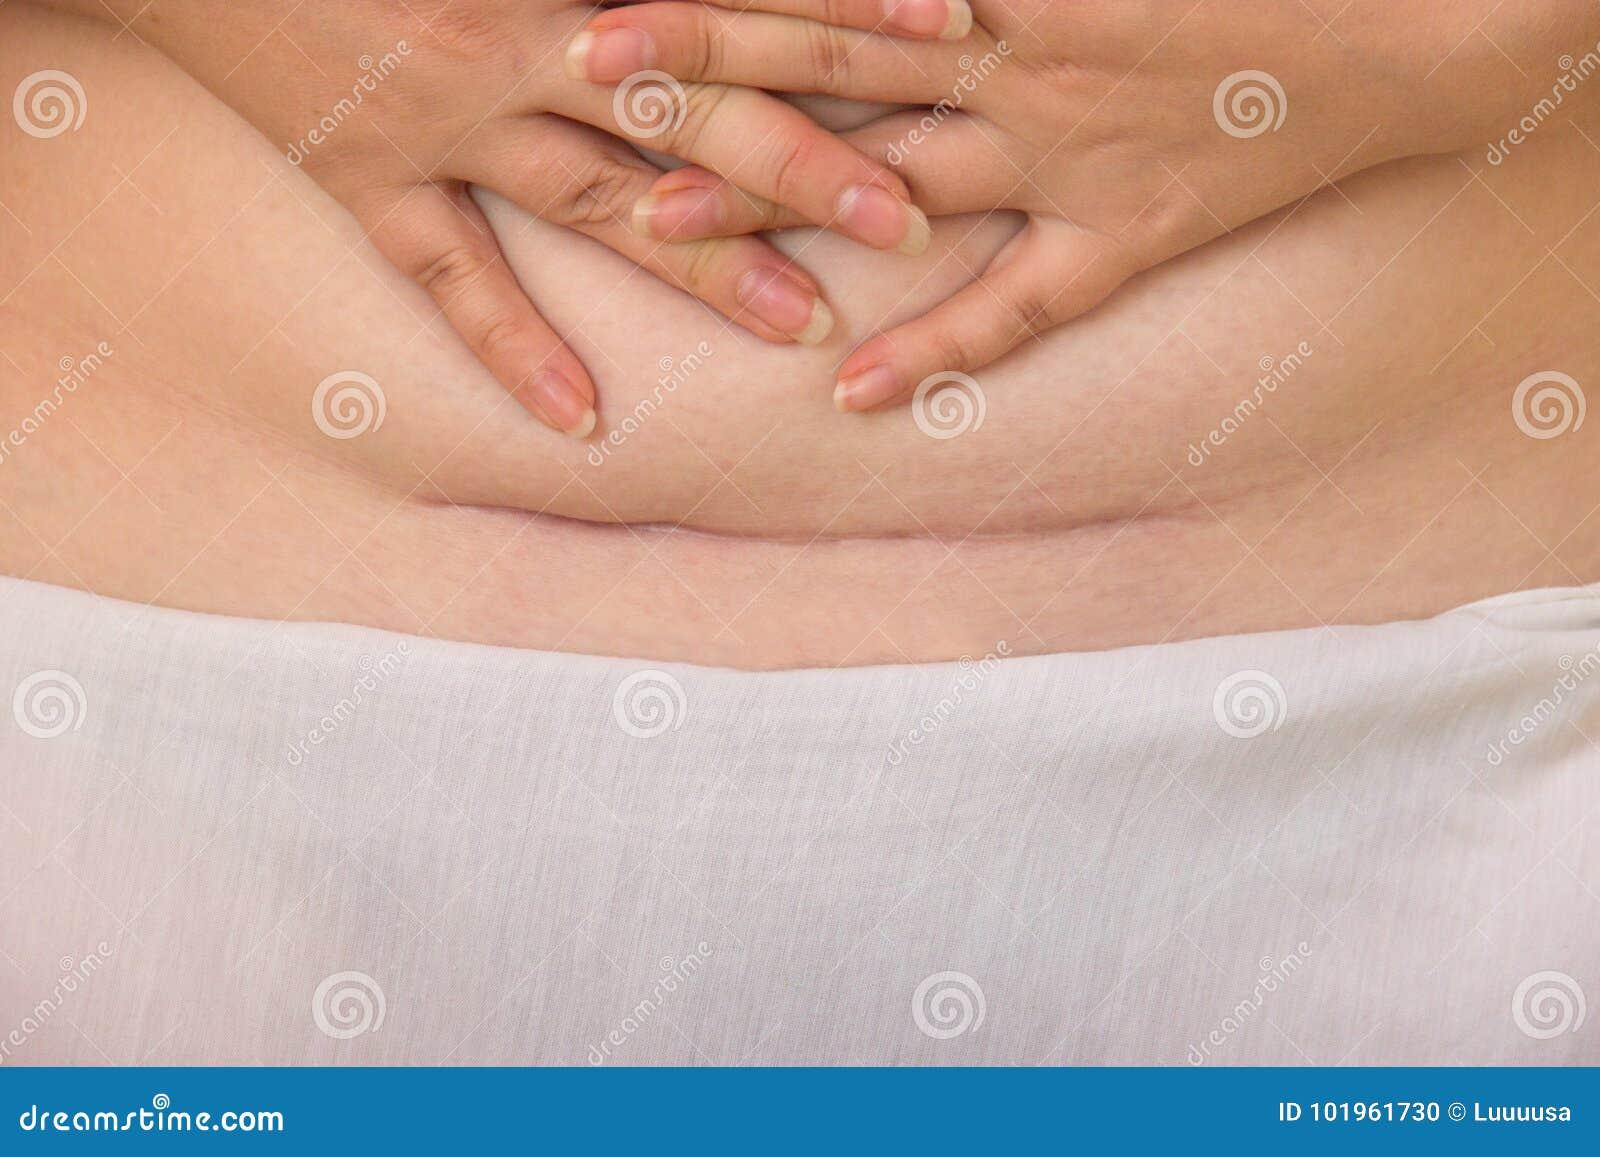 C Section Cesarean Operation Heal After. A Cesarean Scar A ...